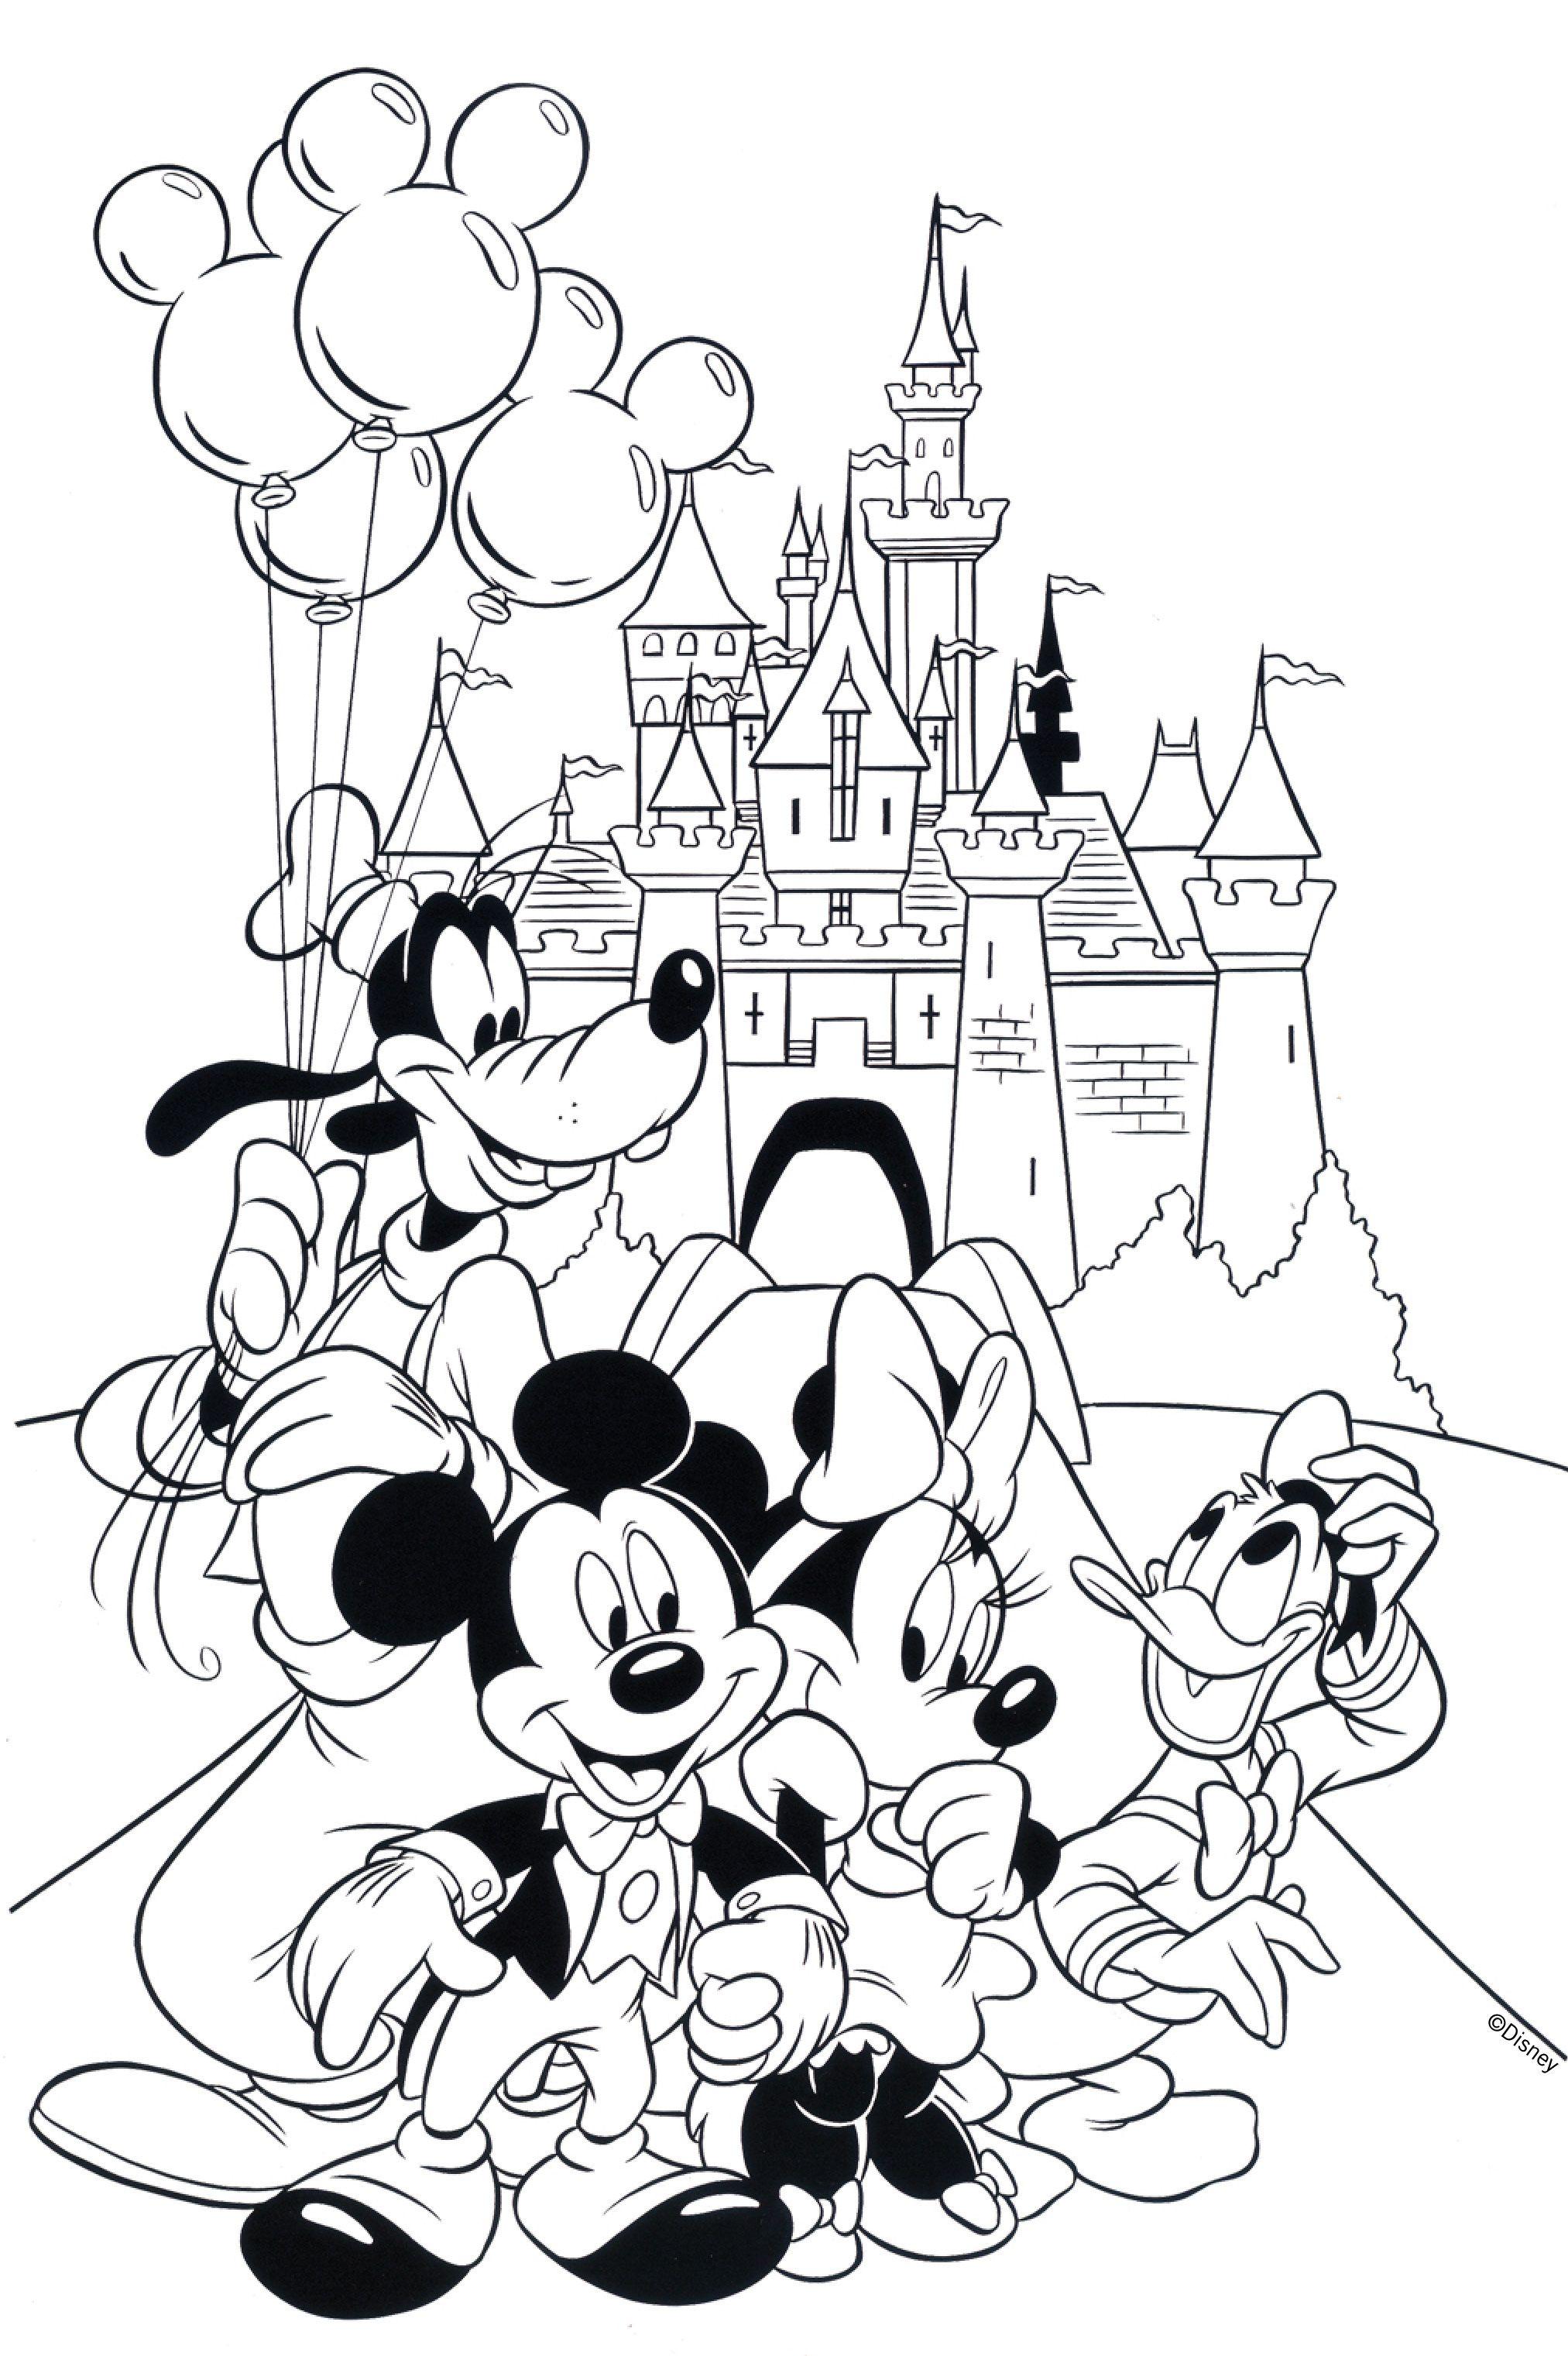 Free Disney Coloring Page! #printable | Crafts | Coloring